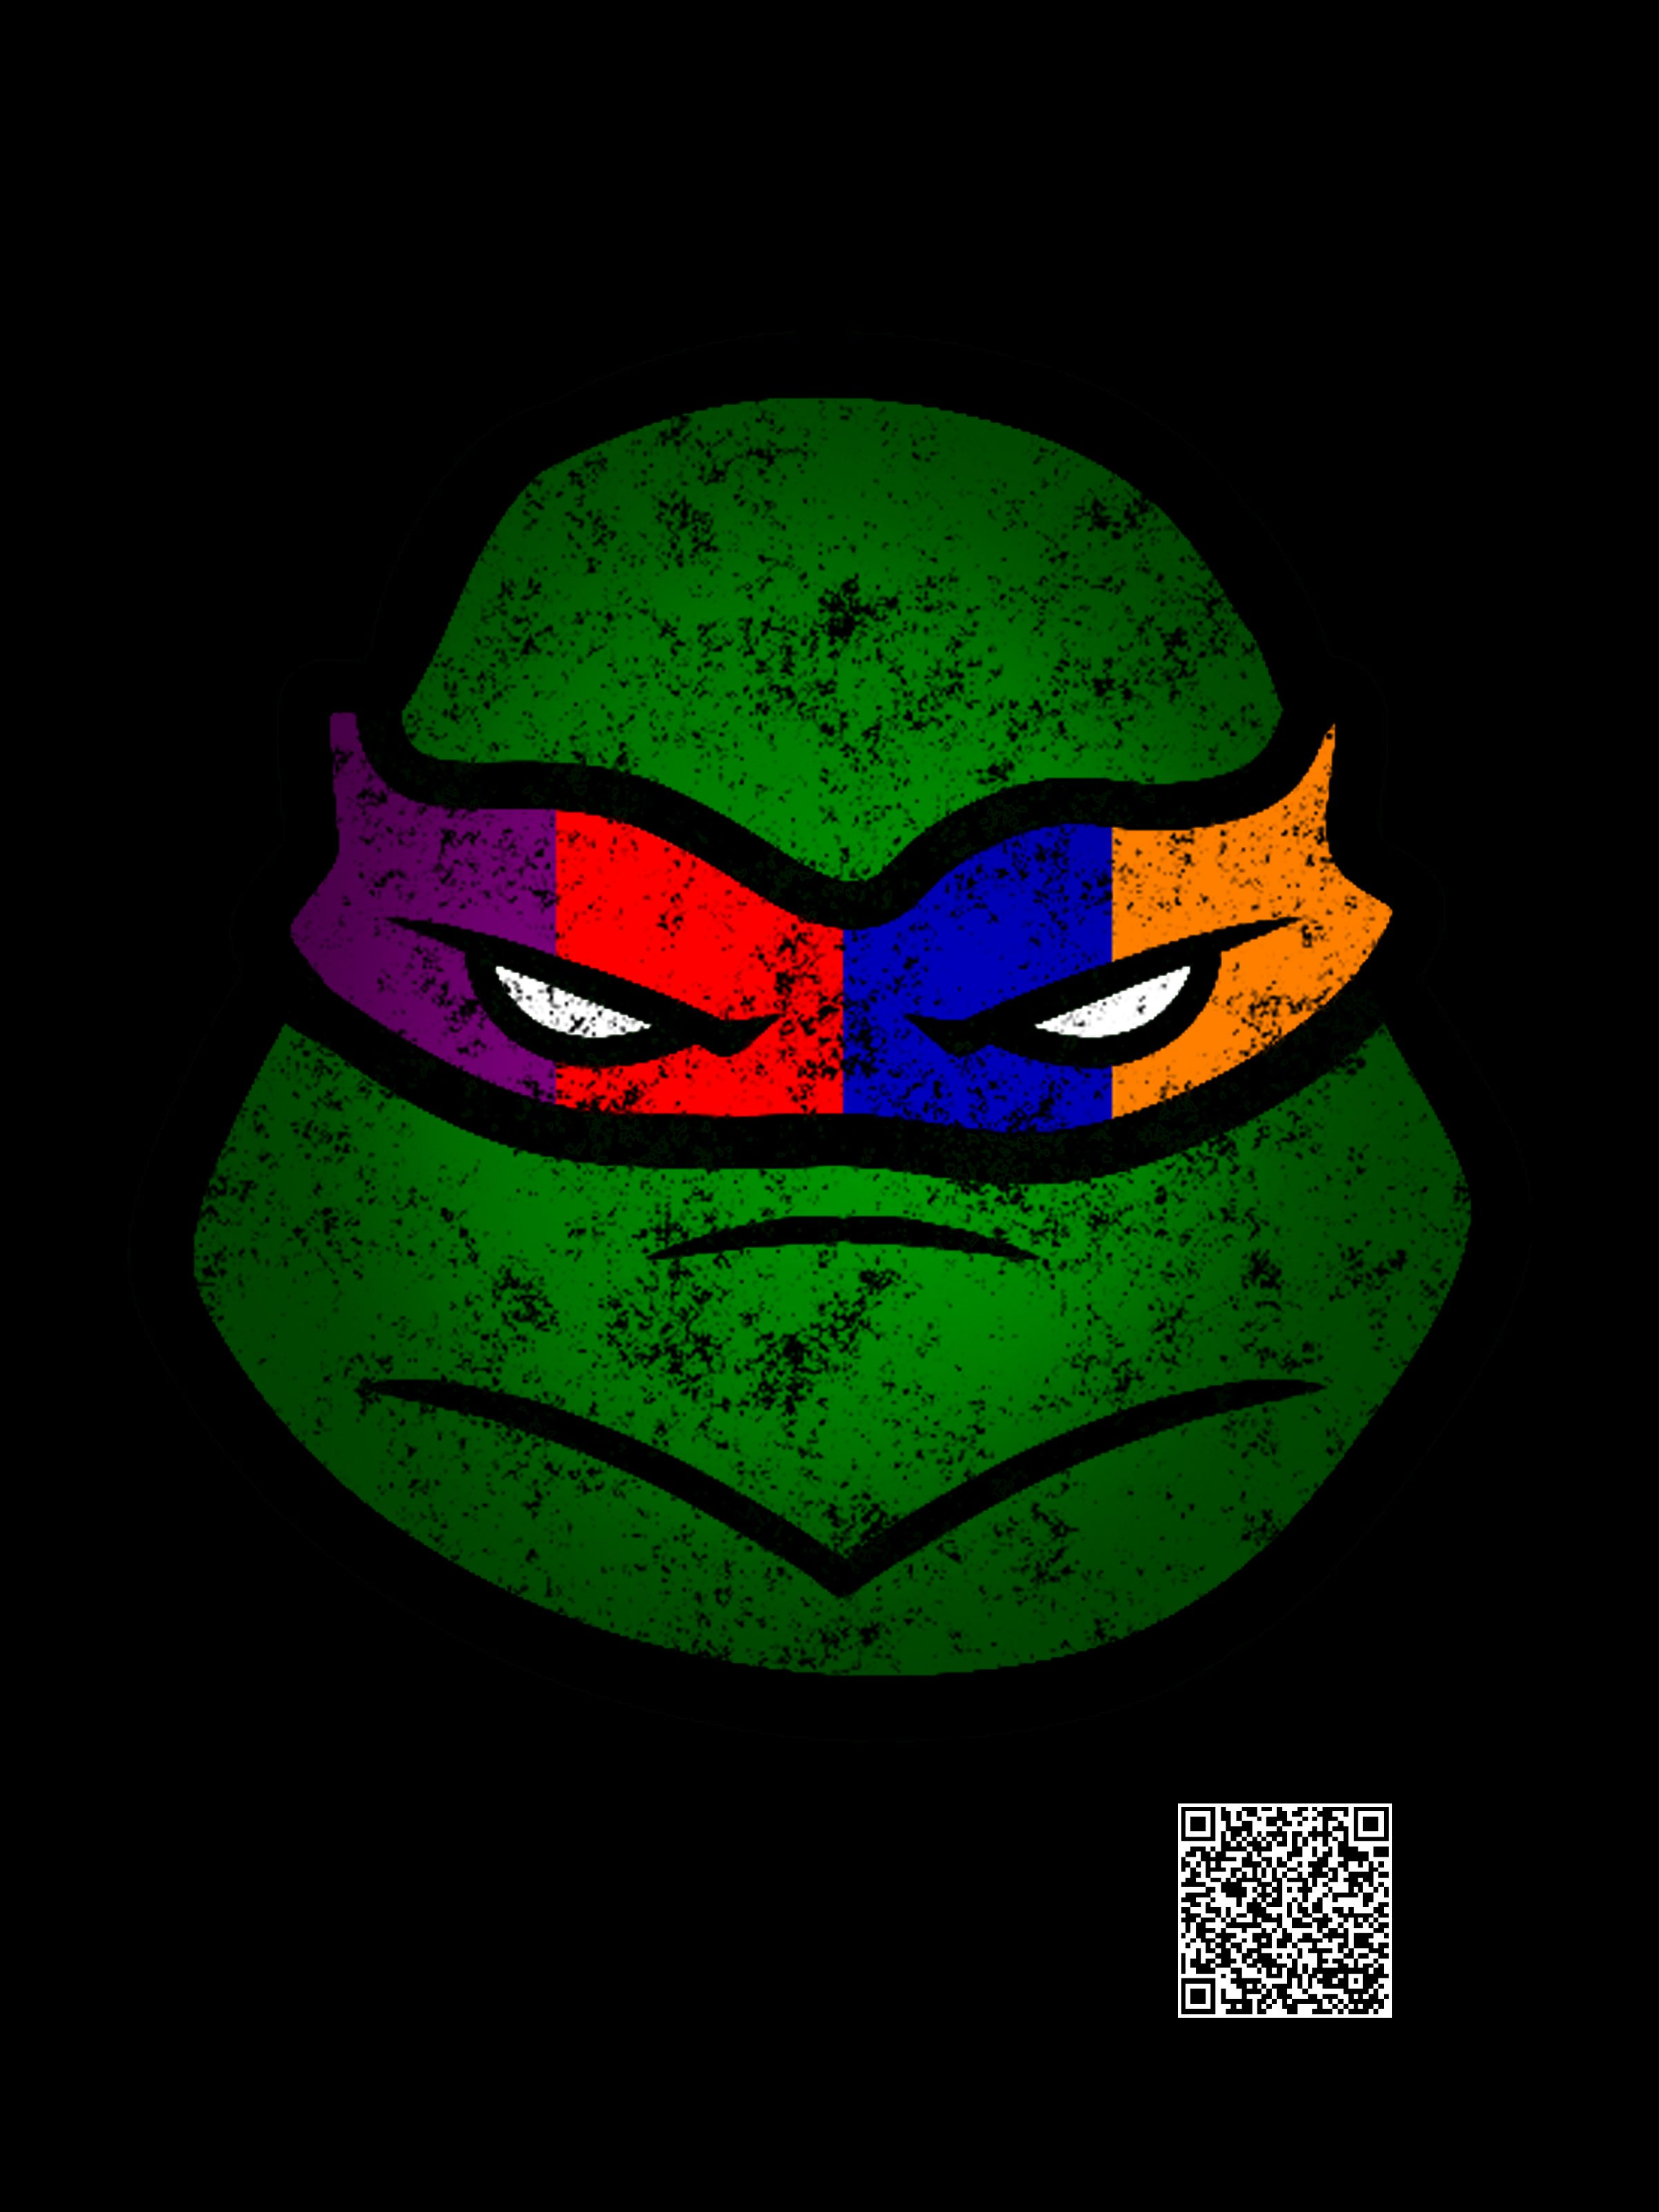 Pin By Takumaru On Teenage Mutant Ninja Turtles Ninja Turtle Tattoos Teenage Mutant Ninja Turtles Art Ninja Turtle Drawing